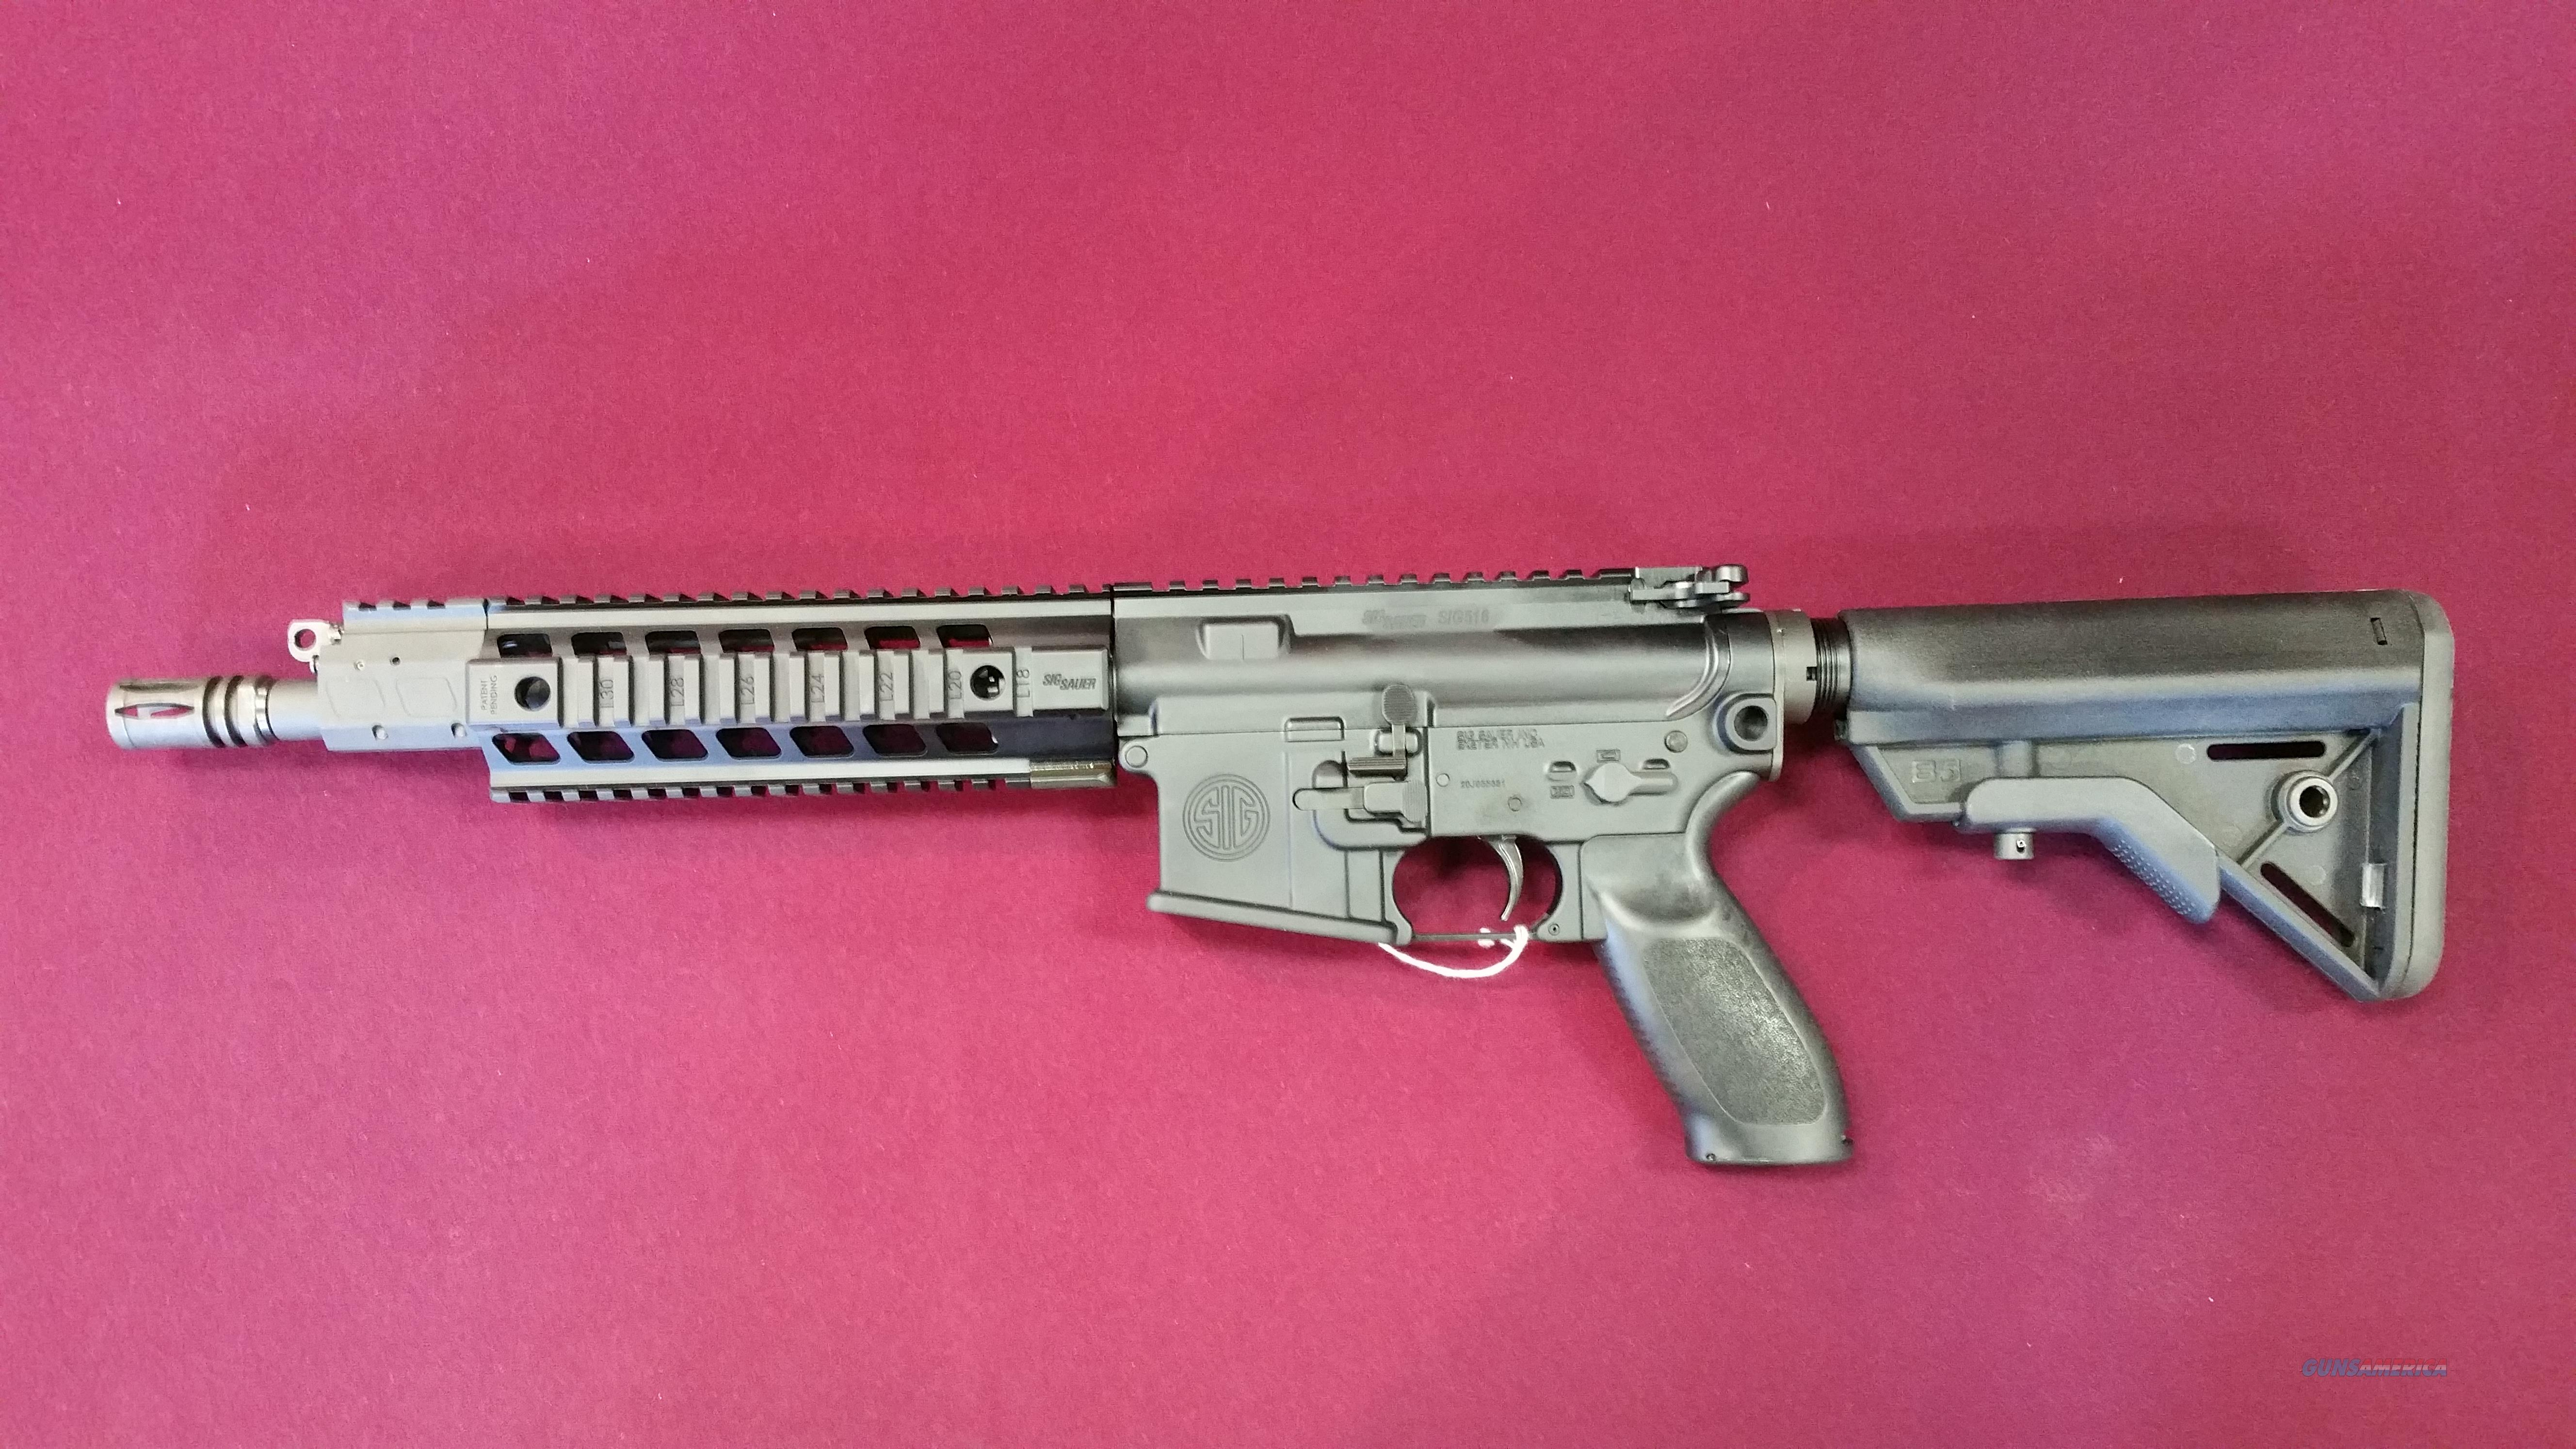 SIG SAUER SIG516 CQB SBR 5.56mm NATO 10 Inch  Guns > Rifles > Sig - Sauer/Sigarms Rifles